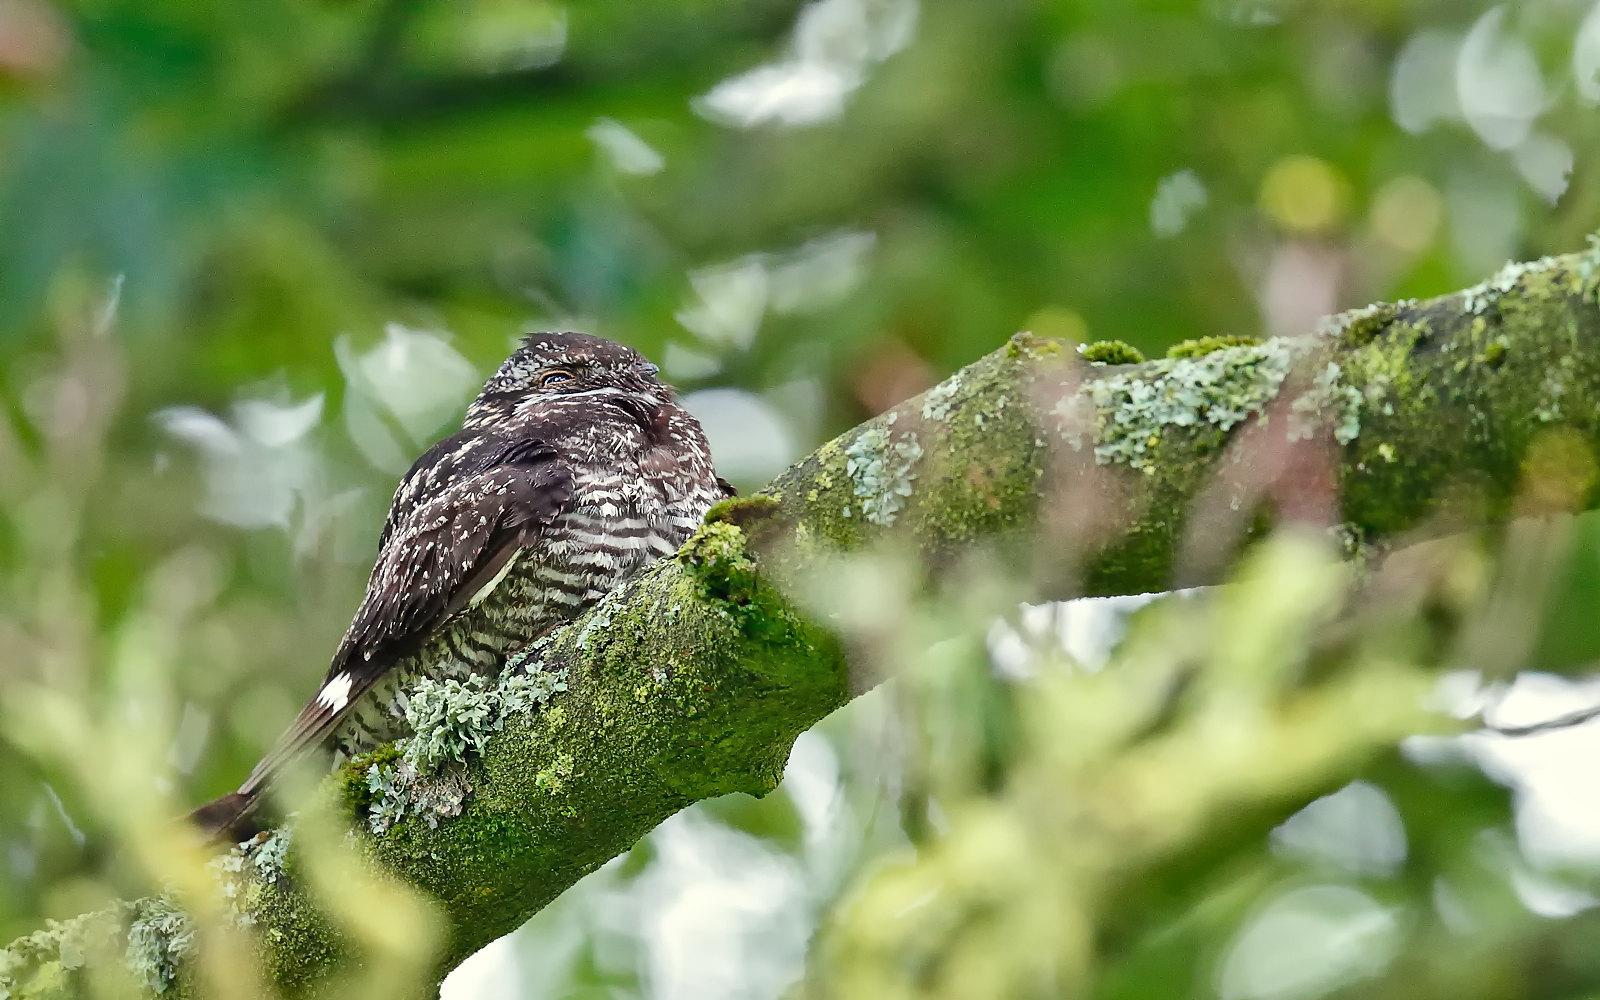 Common Nighthawk - male